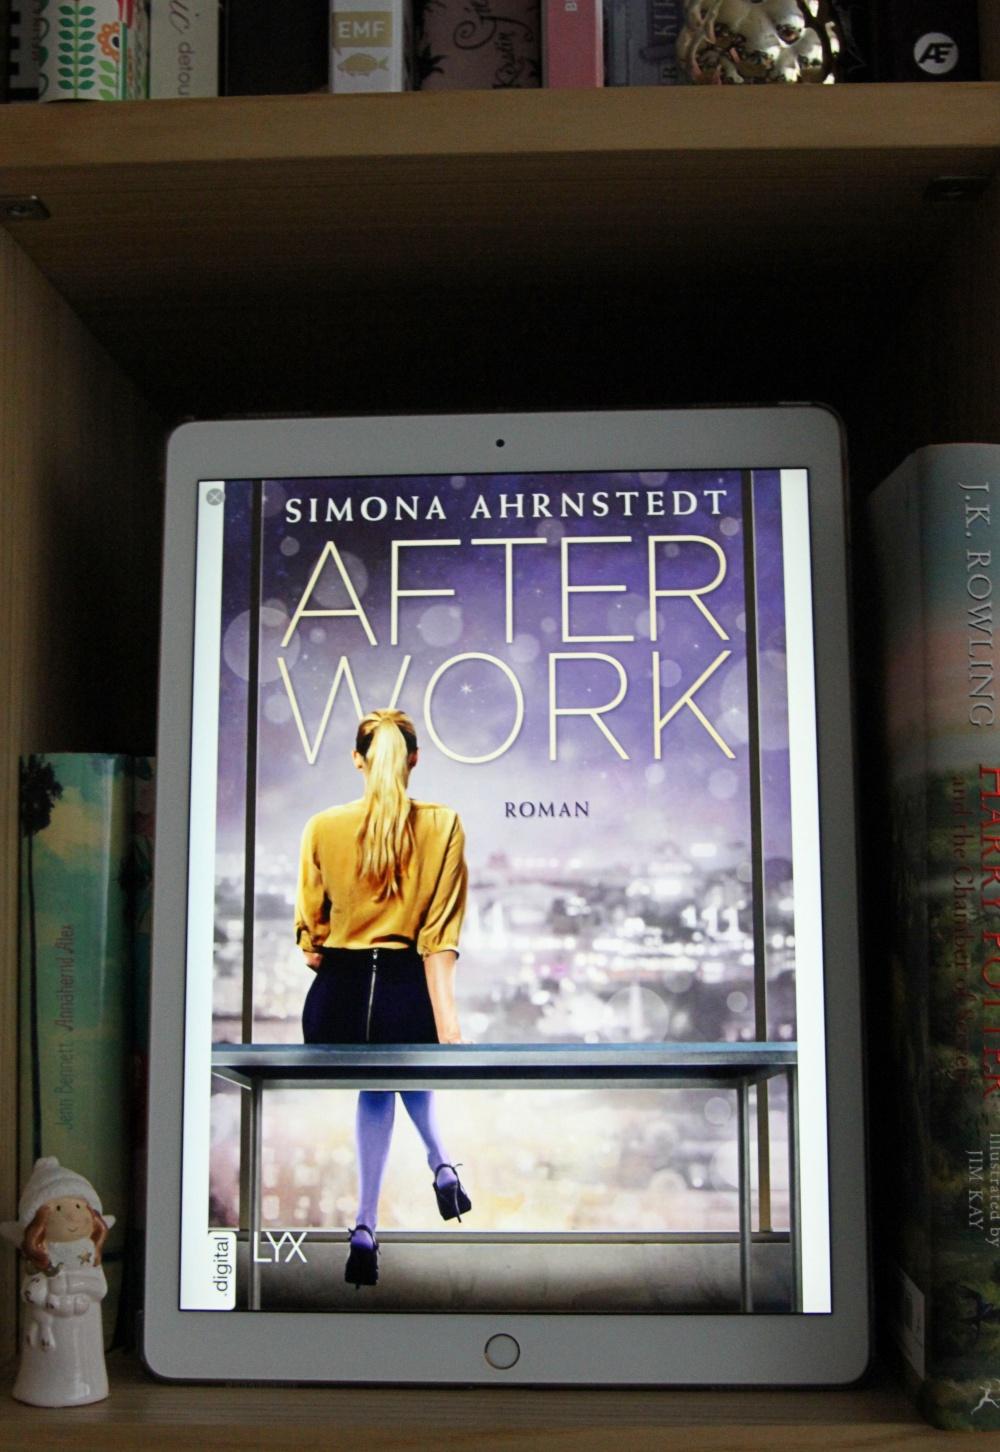 BuchSaiten_Jahresrückblick 2018_Lesejahr 2018_After Work Simona Ahrnstedt